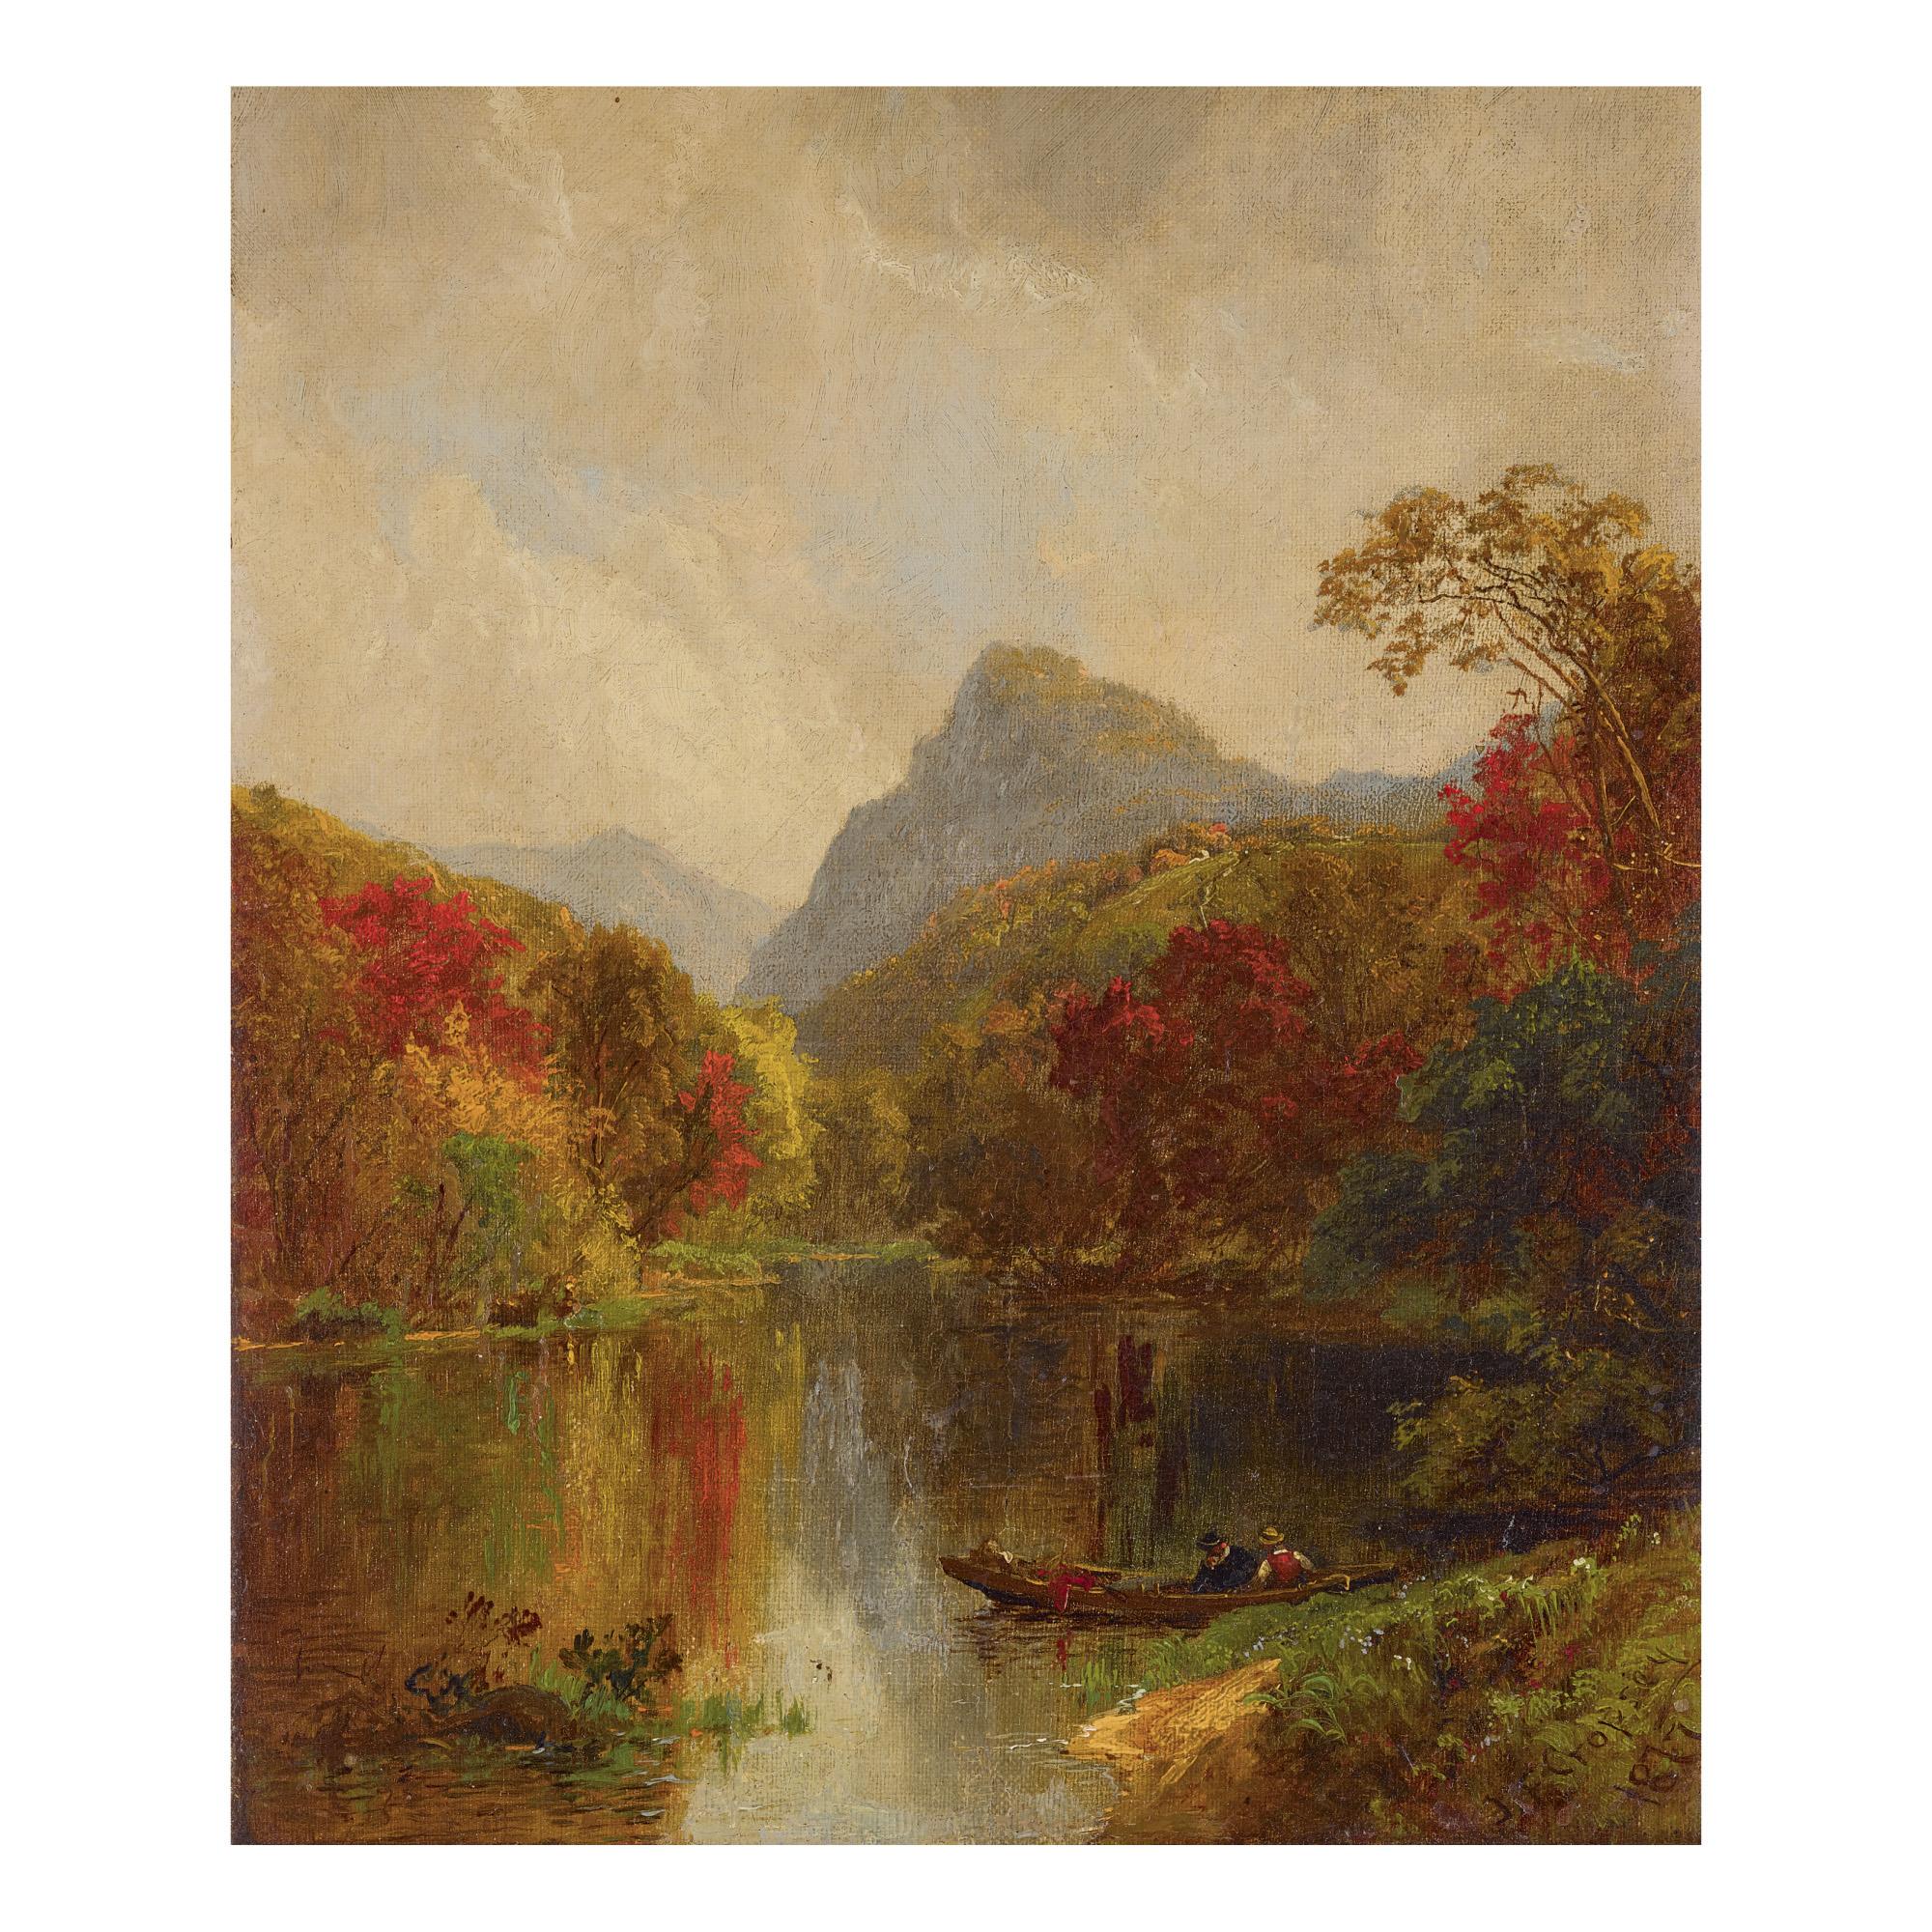 JASPER FRANCIS CROPSEY | AUTUMN LANDSCAPE (LAKE GEORGE)